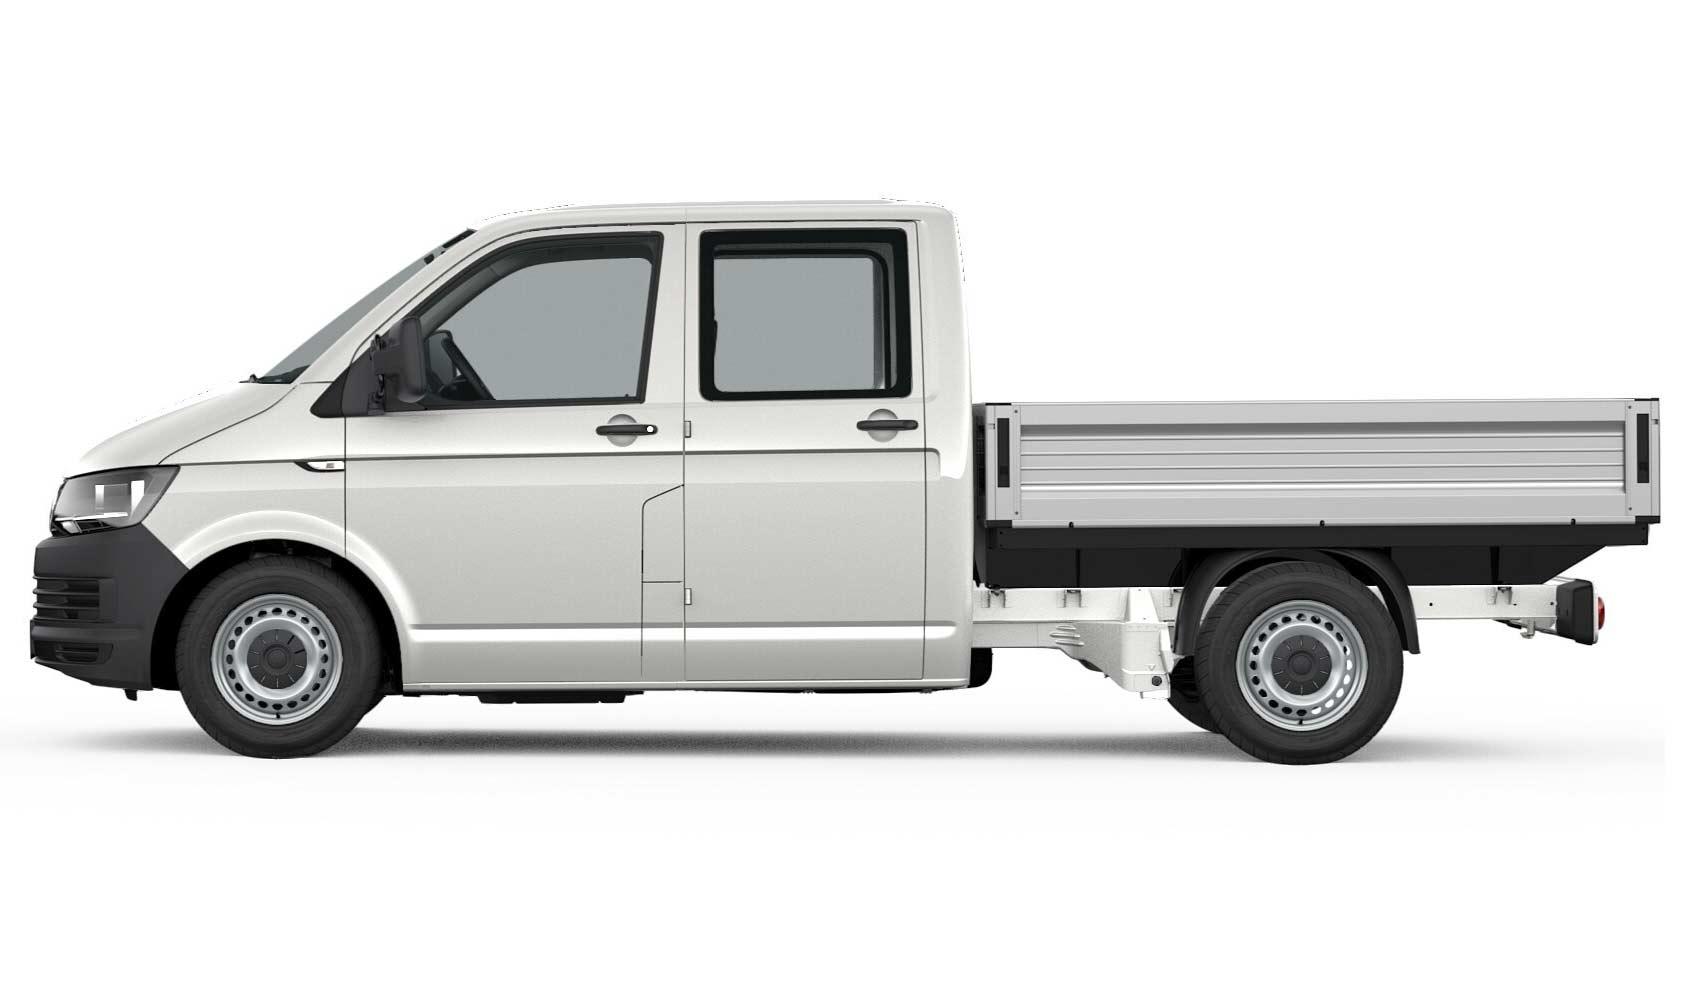 "Transporter Pritsche Doppelkabine ""EcoProfi"", 2,0 l TDI EU6 SCR BlueMotion Technology 75 kW Getriebe: 5-Gang-Schaltgetriebe Radstand: 3000 mm"